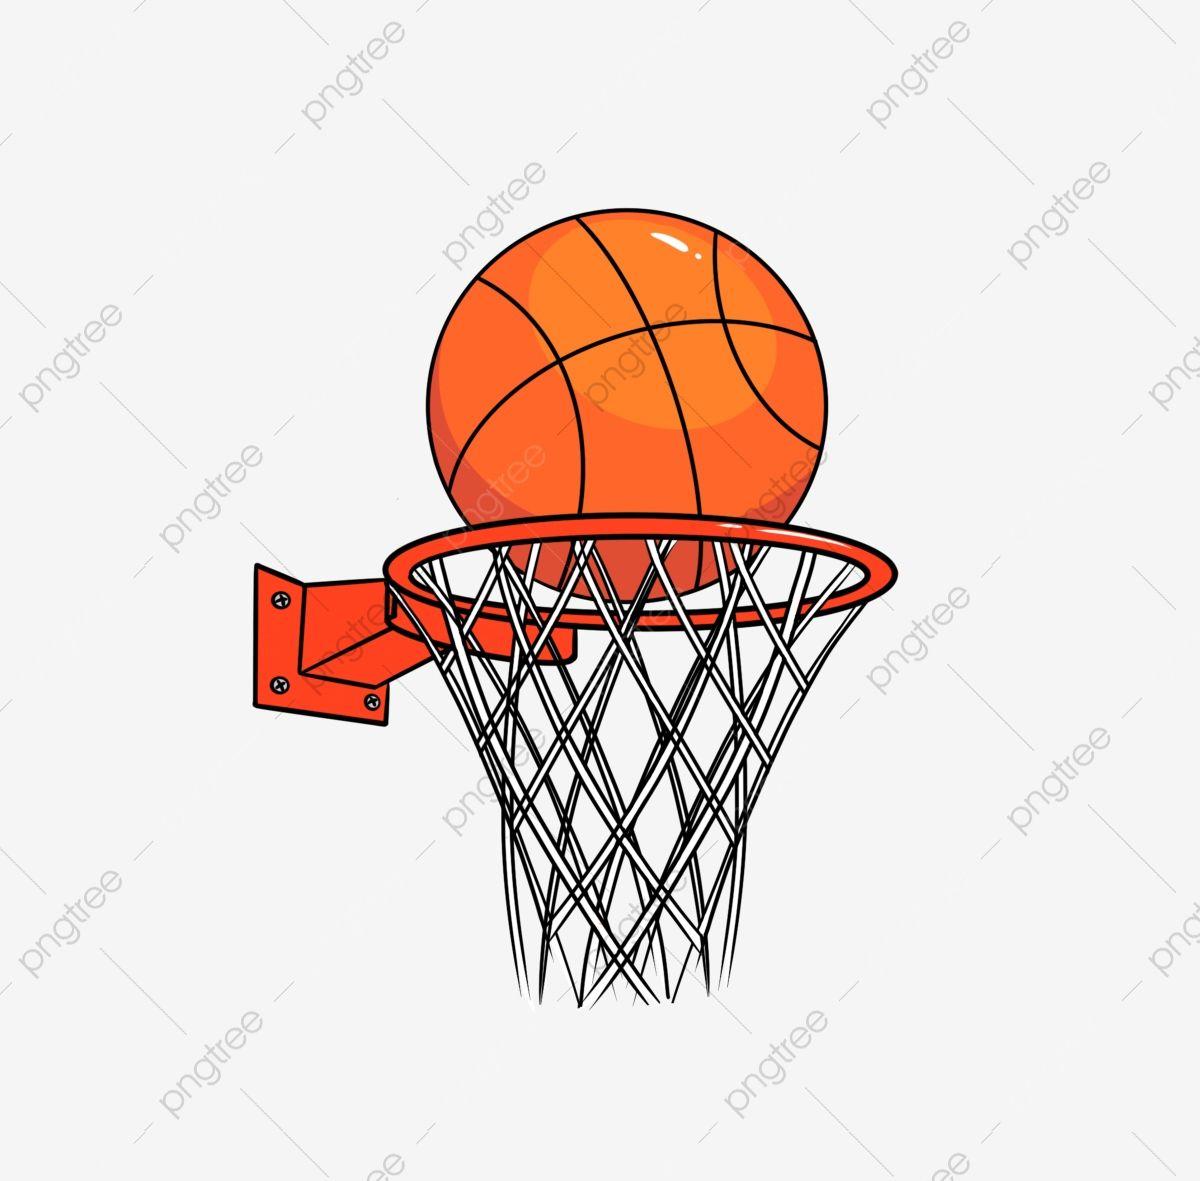 Cartoon Street Basketball Hoop And Orange Ball Street Basketball Basketball Hoop Basketball Drawings